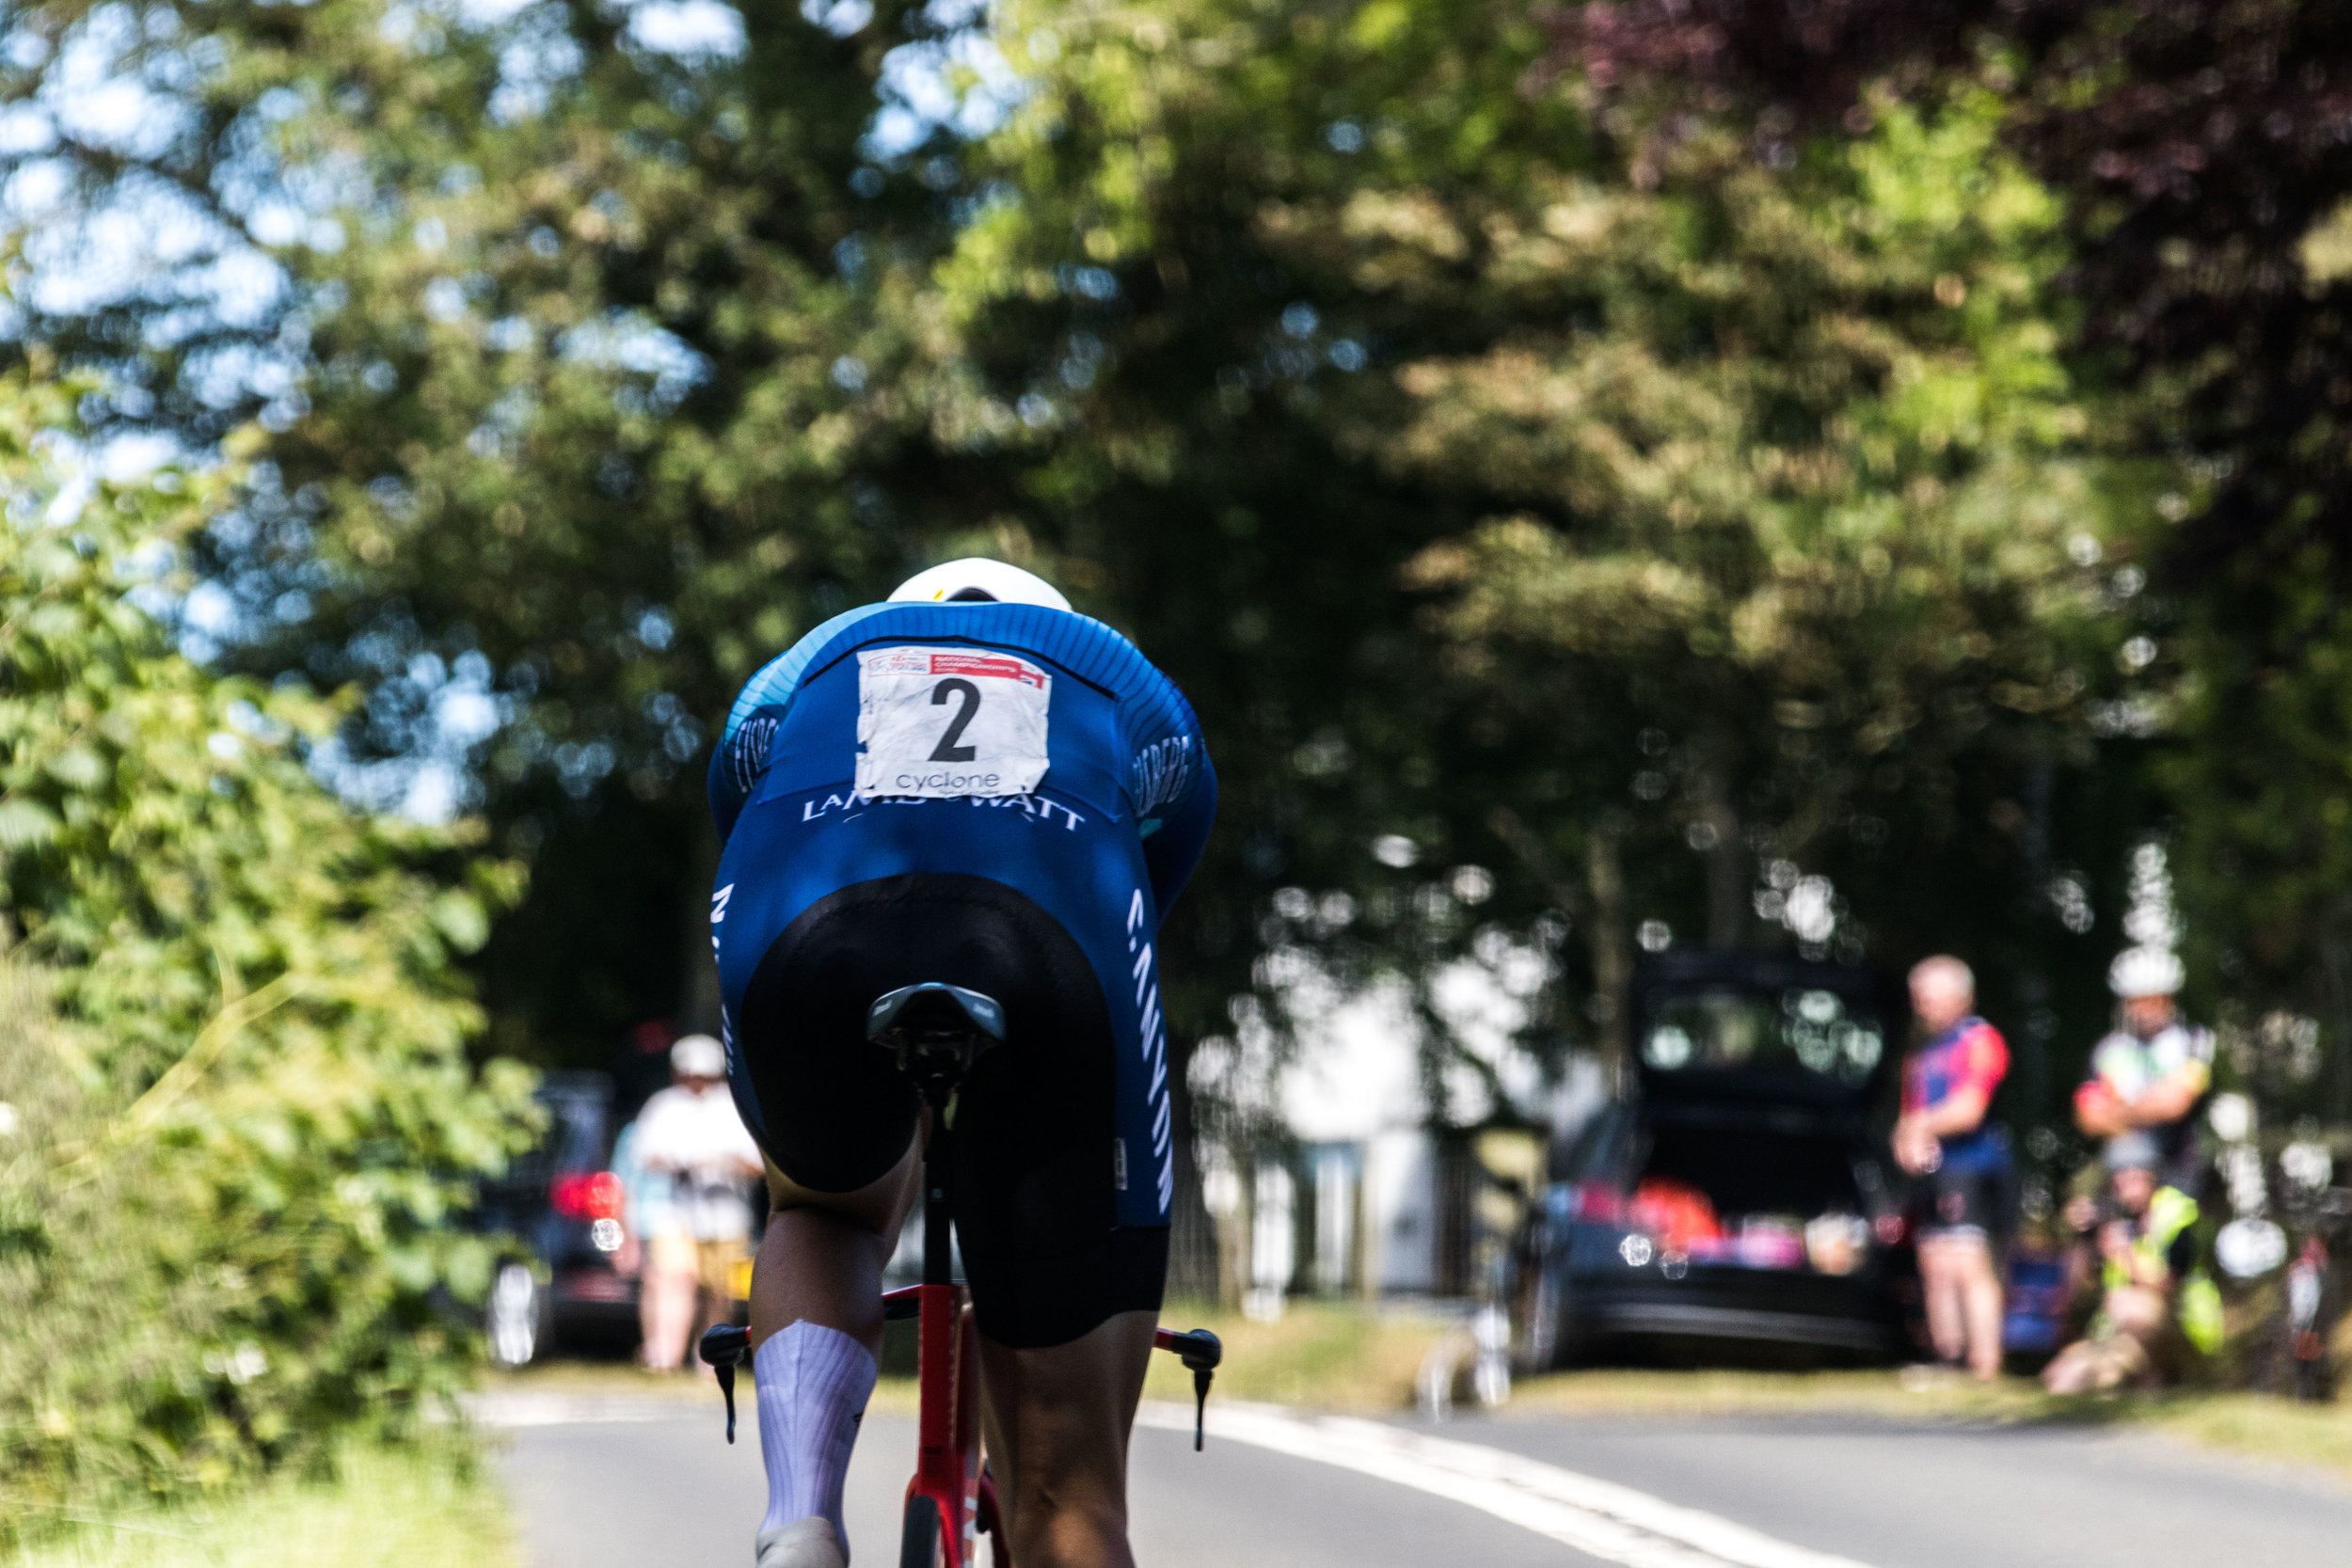 Charlie Tanfield TT U23-17.jpg